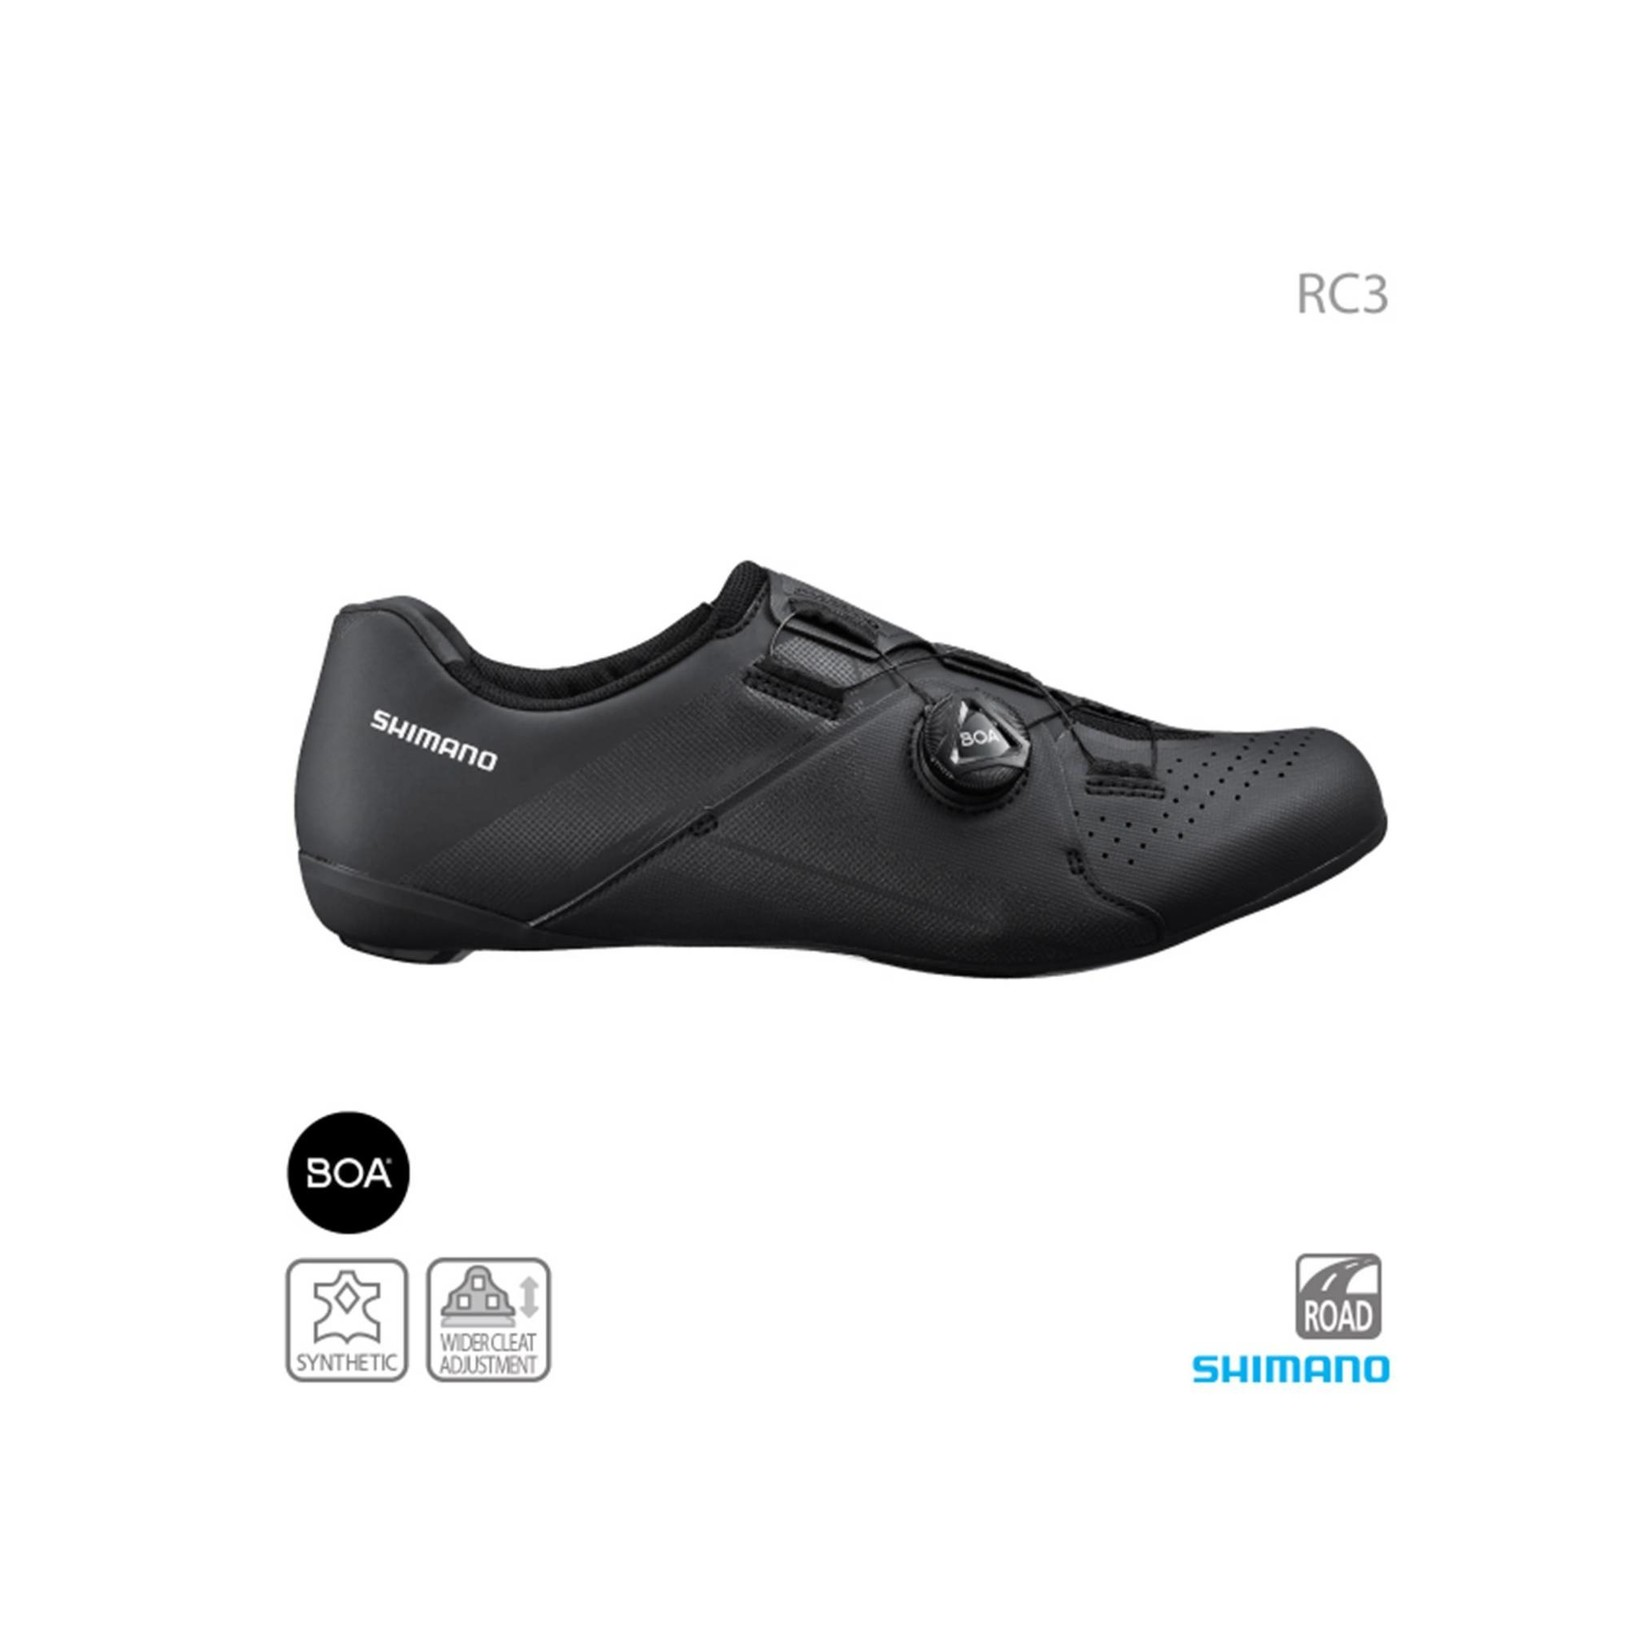 Shimano RC300 Road Shoe MY21